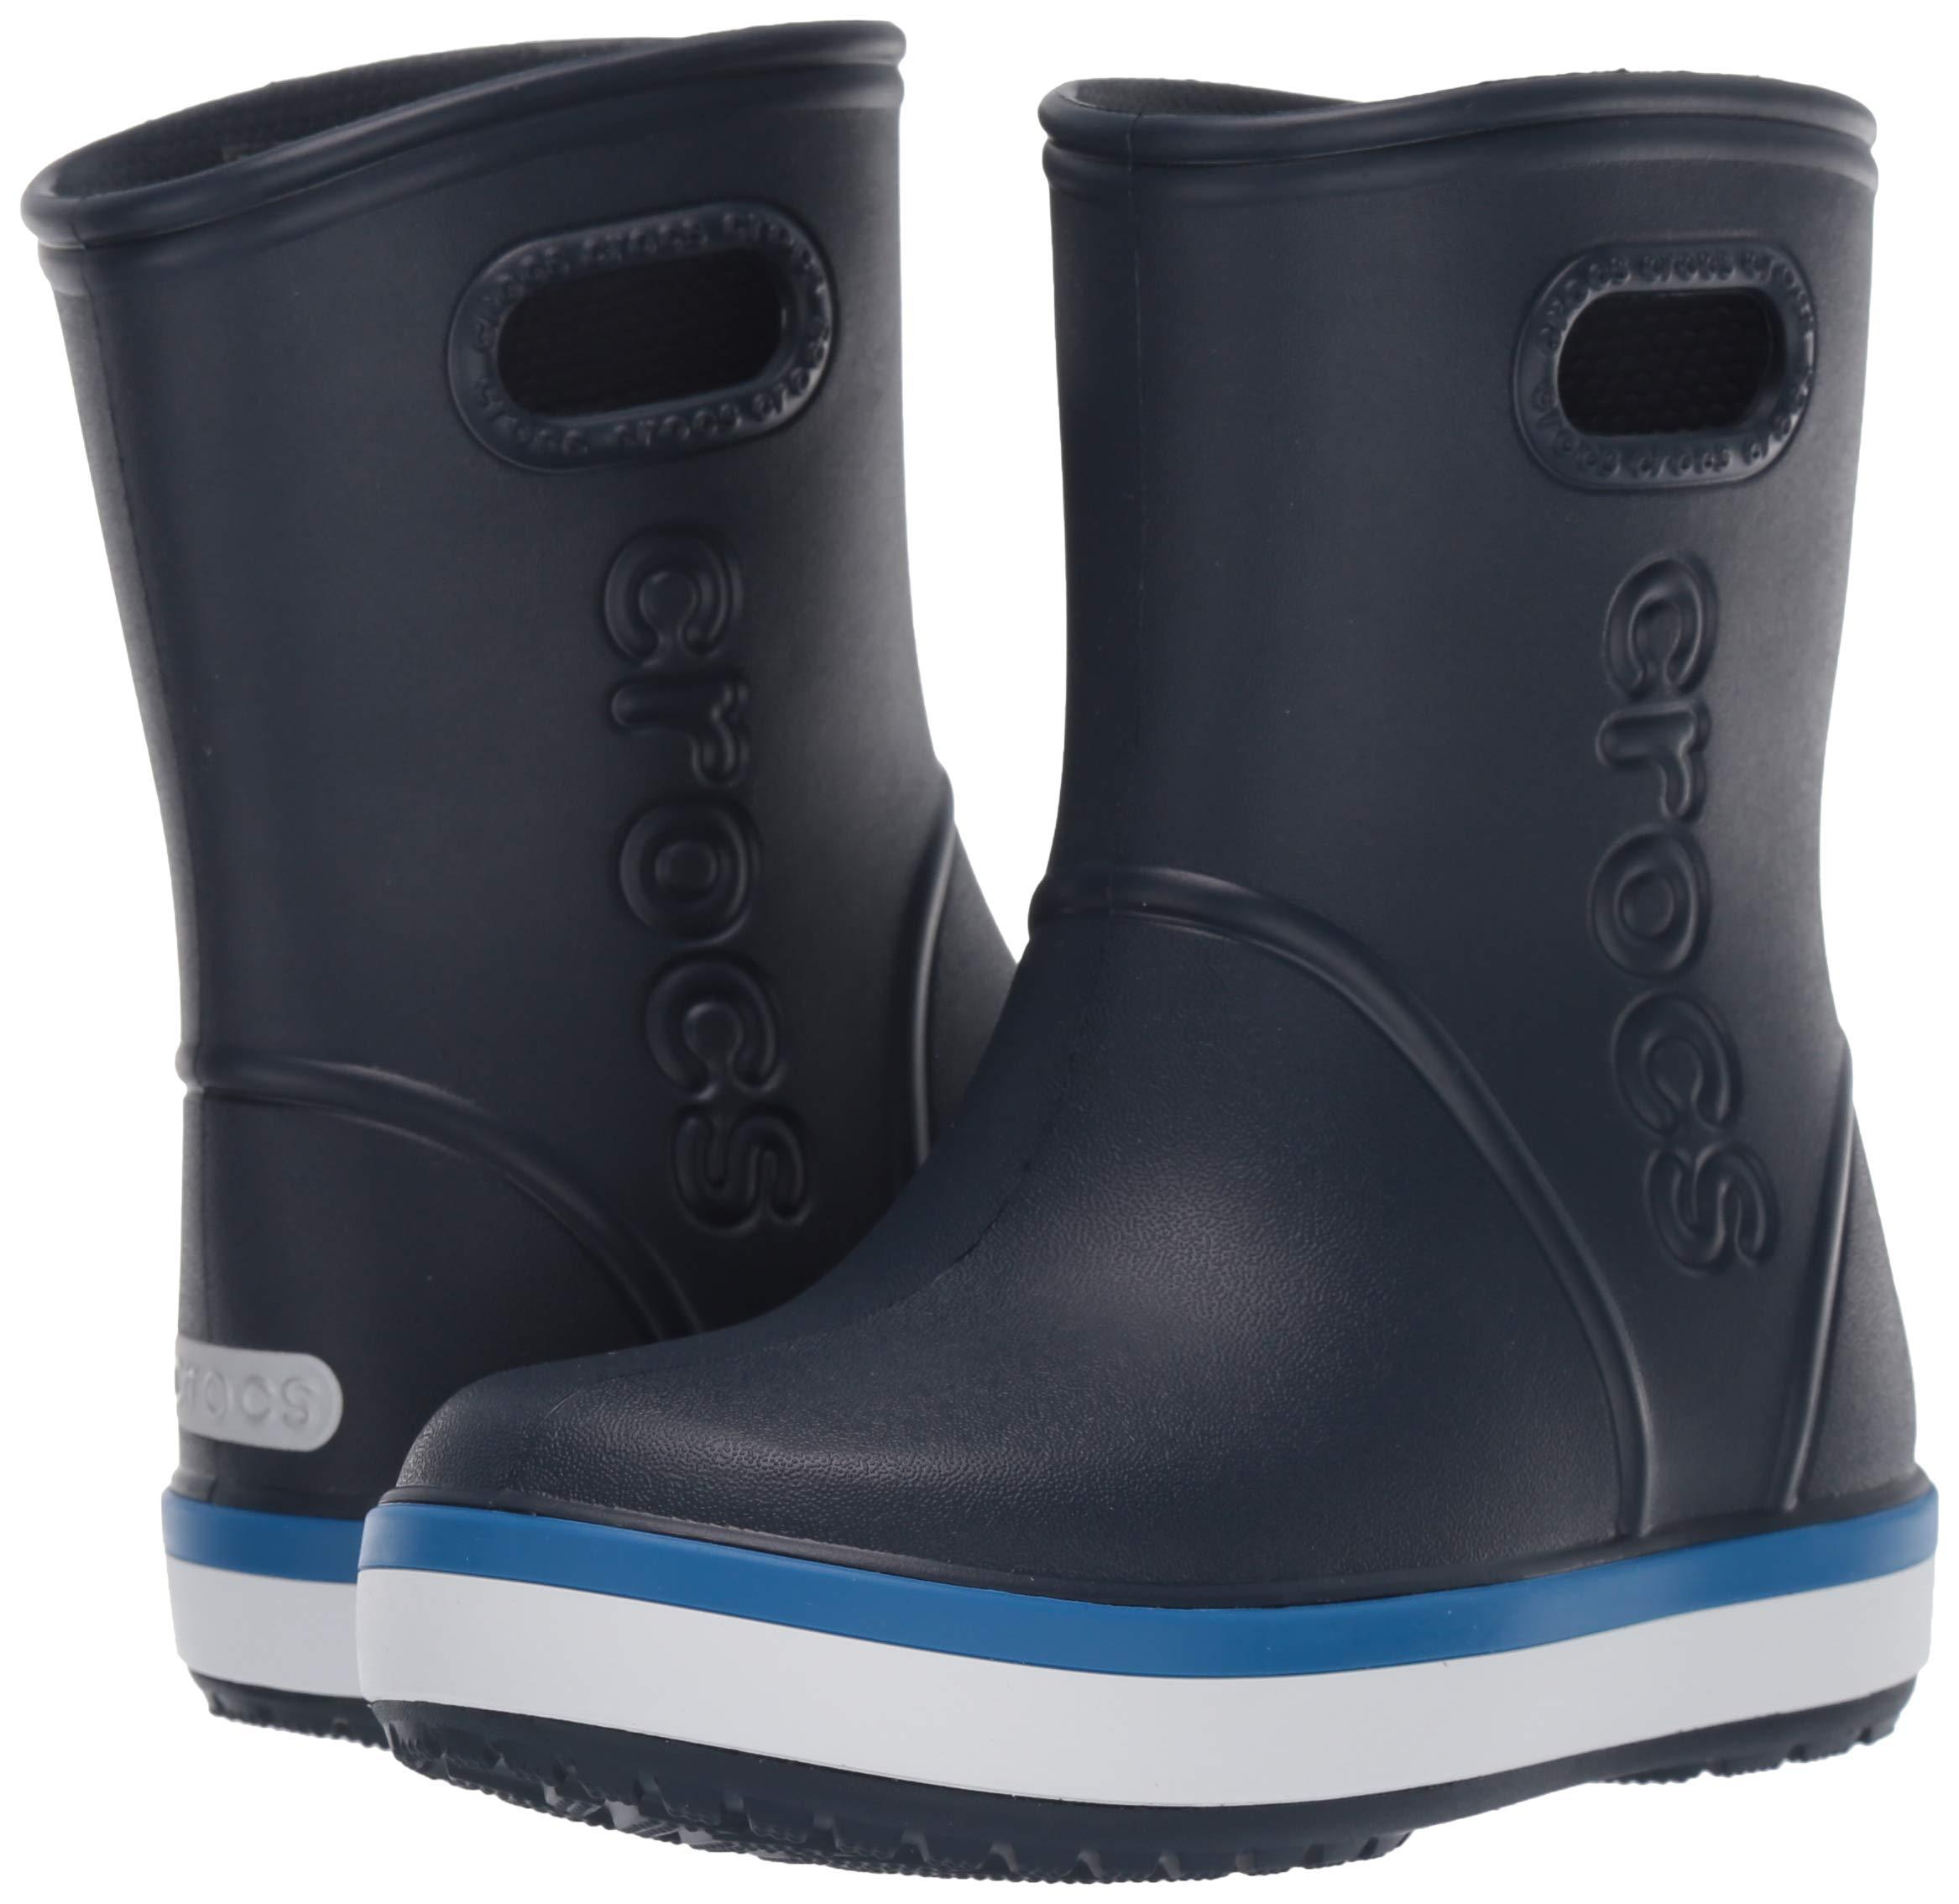 Crocs Unisex Crocband Rain Boot, Navy/Bright Cobalt, 2 M US Little Kid by Crocs (Image #6)